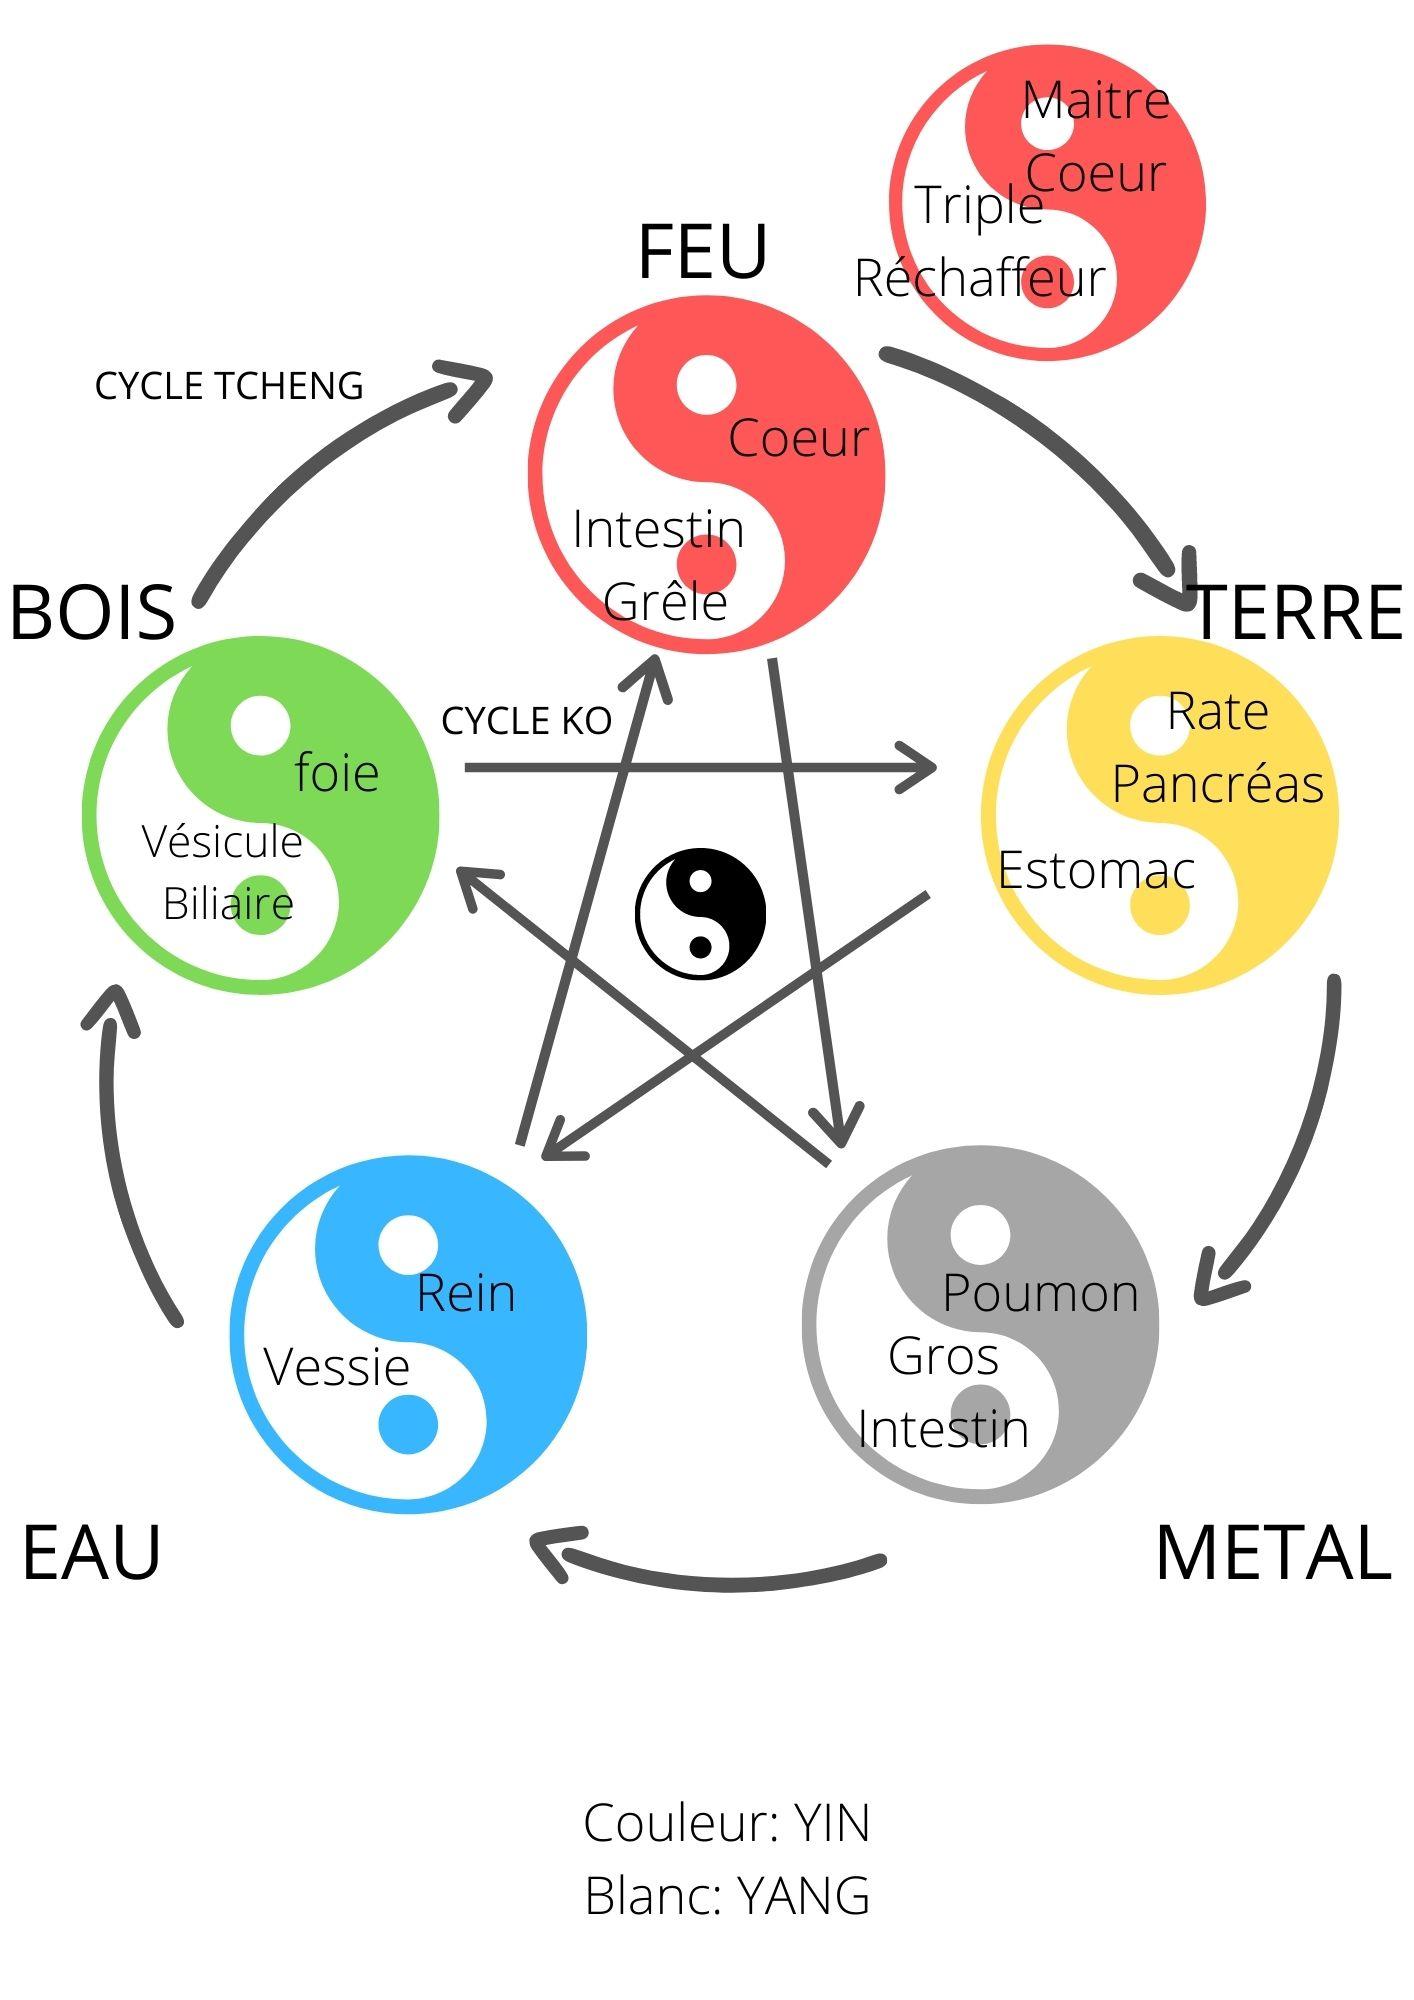 cinq_elements_bois_feu_eau_terre_metal